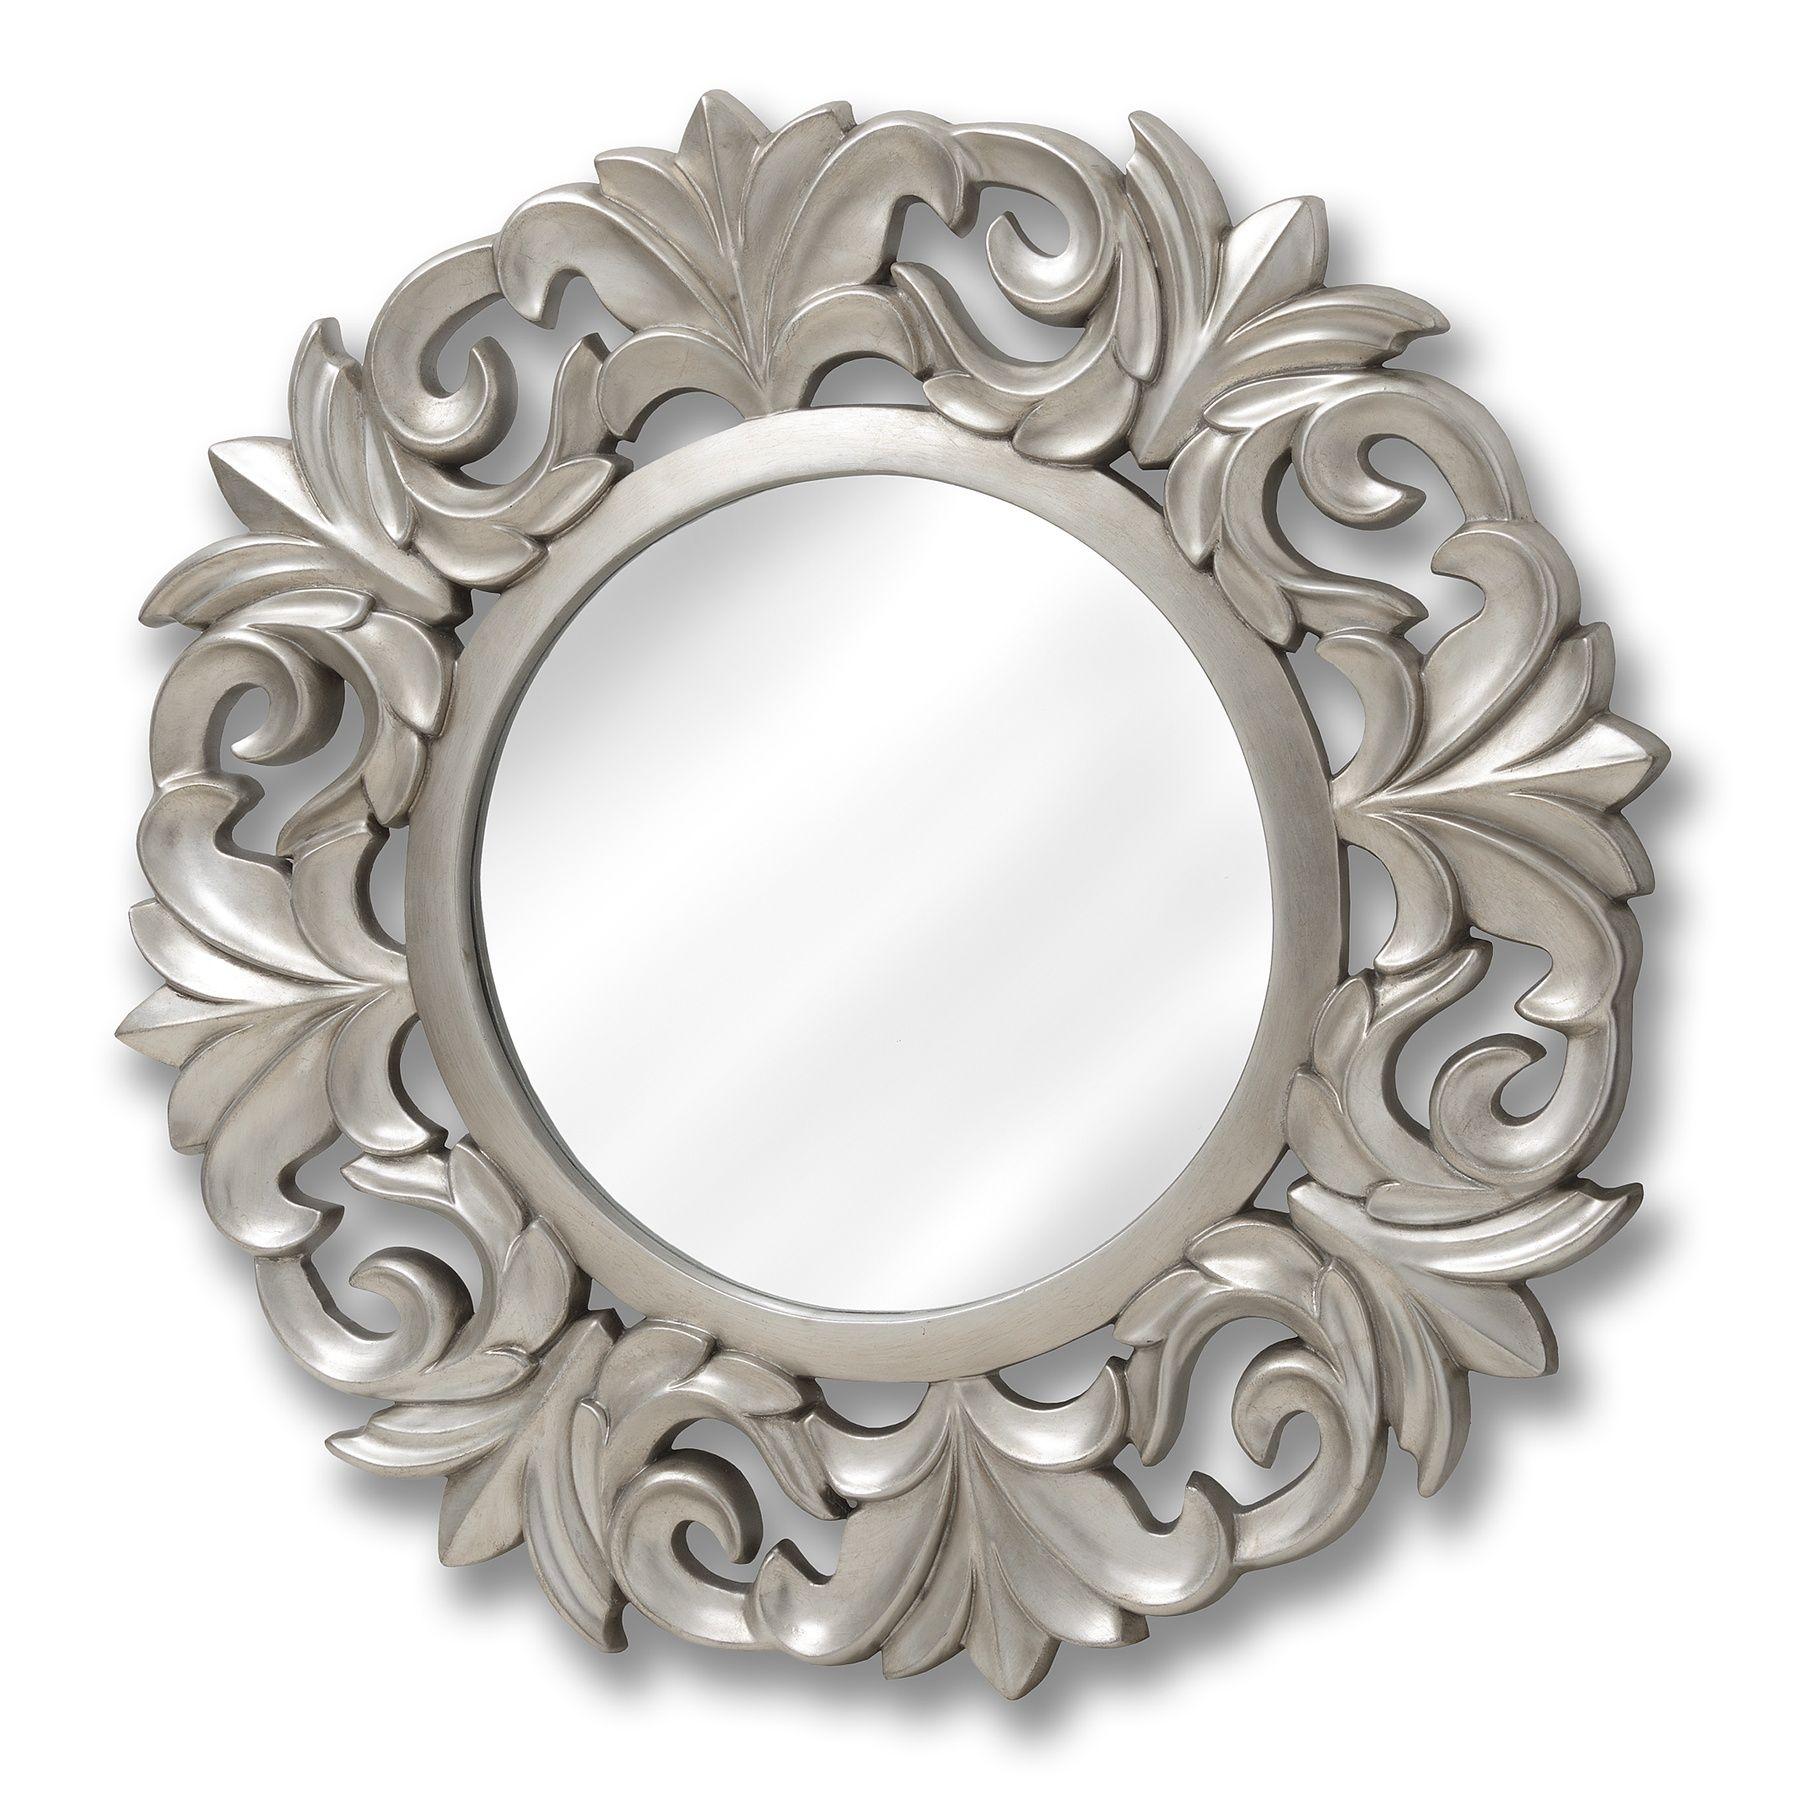 Large Baroque Circular Mirror | Circular mirror, Round mirrors and ...